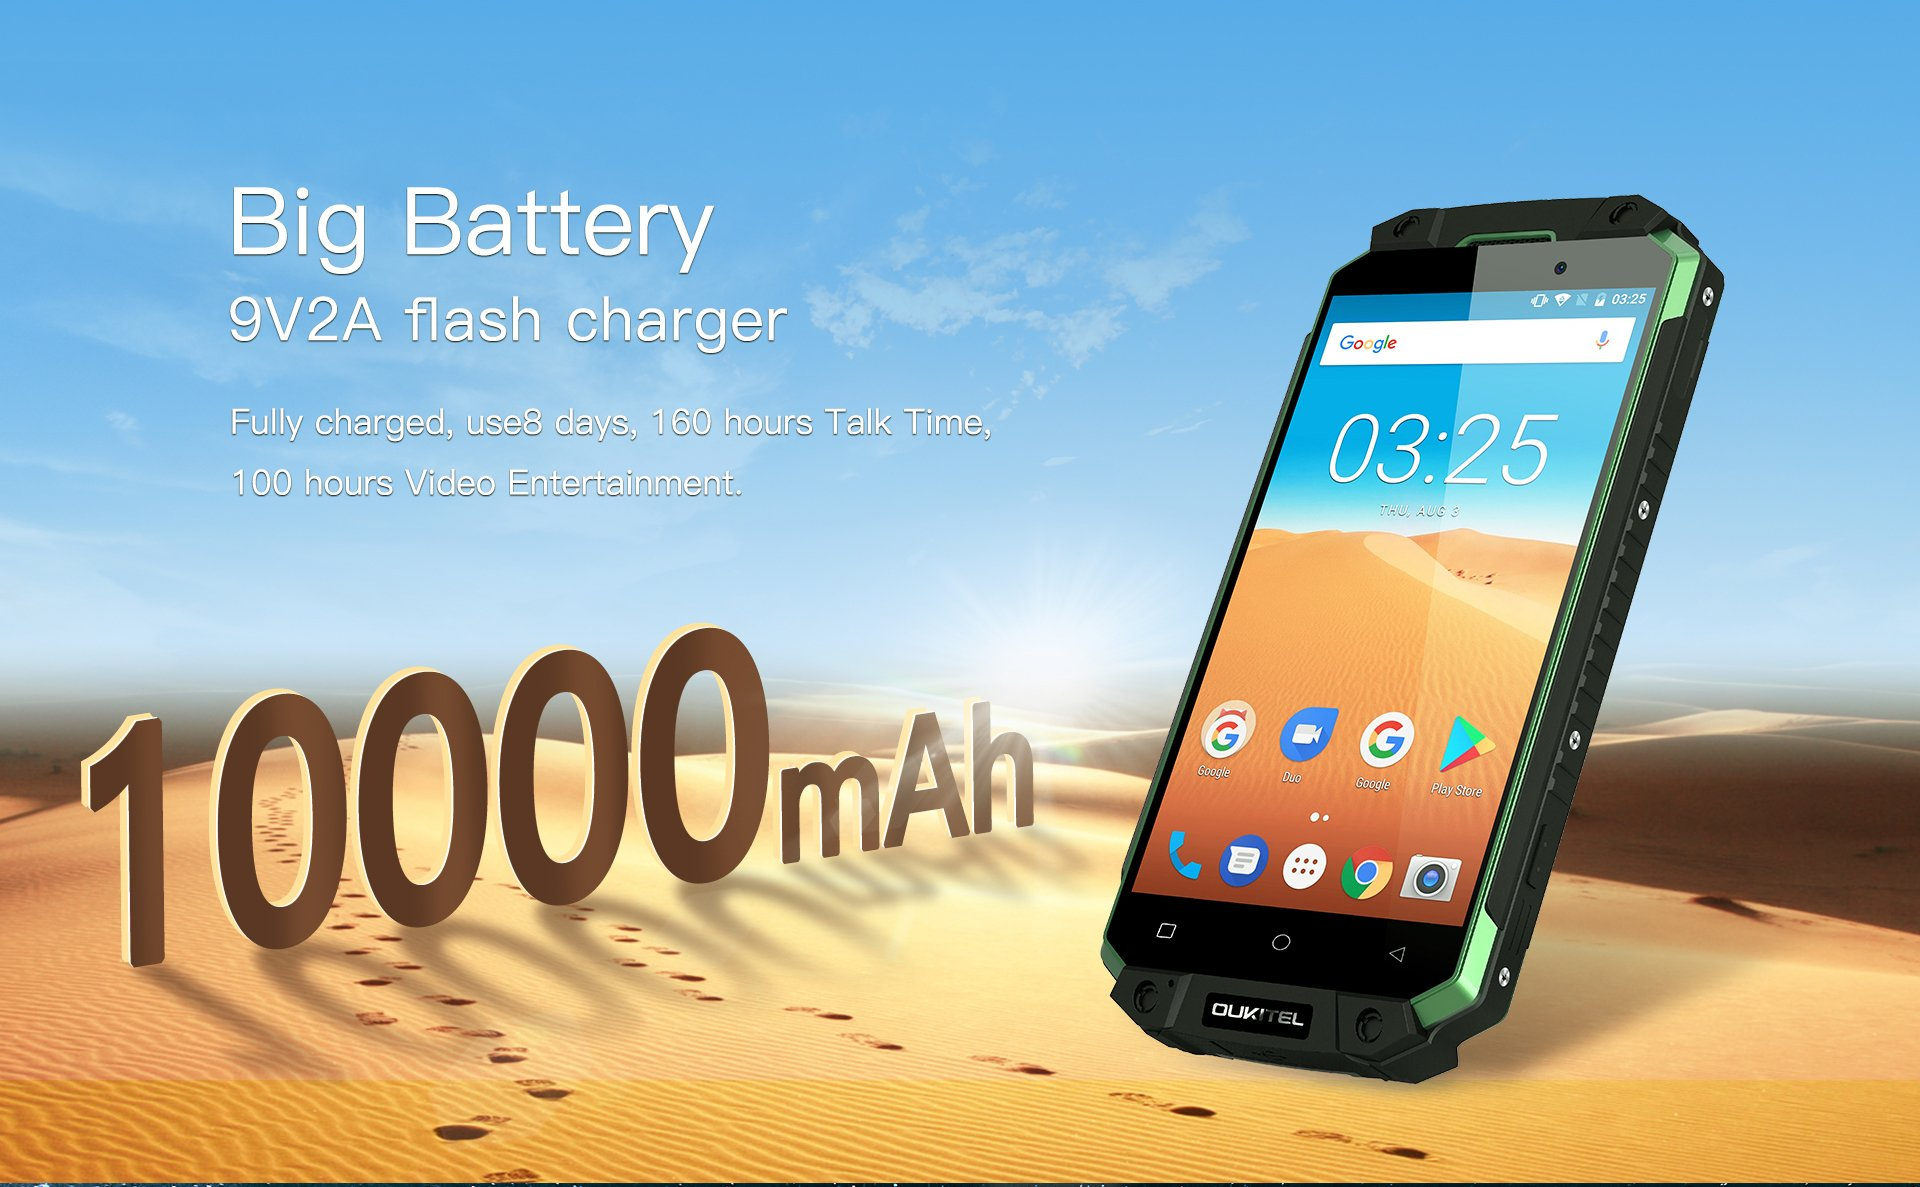 OUKITEL K10000 MAX summer battery